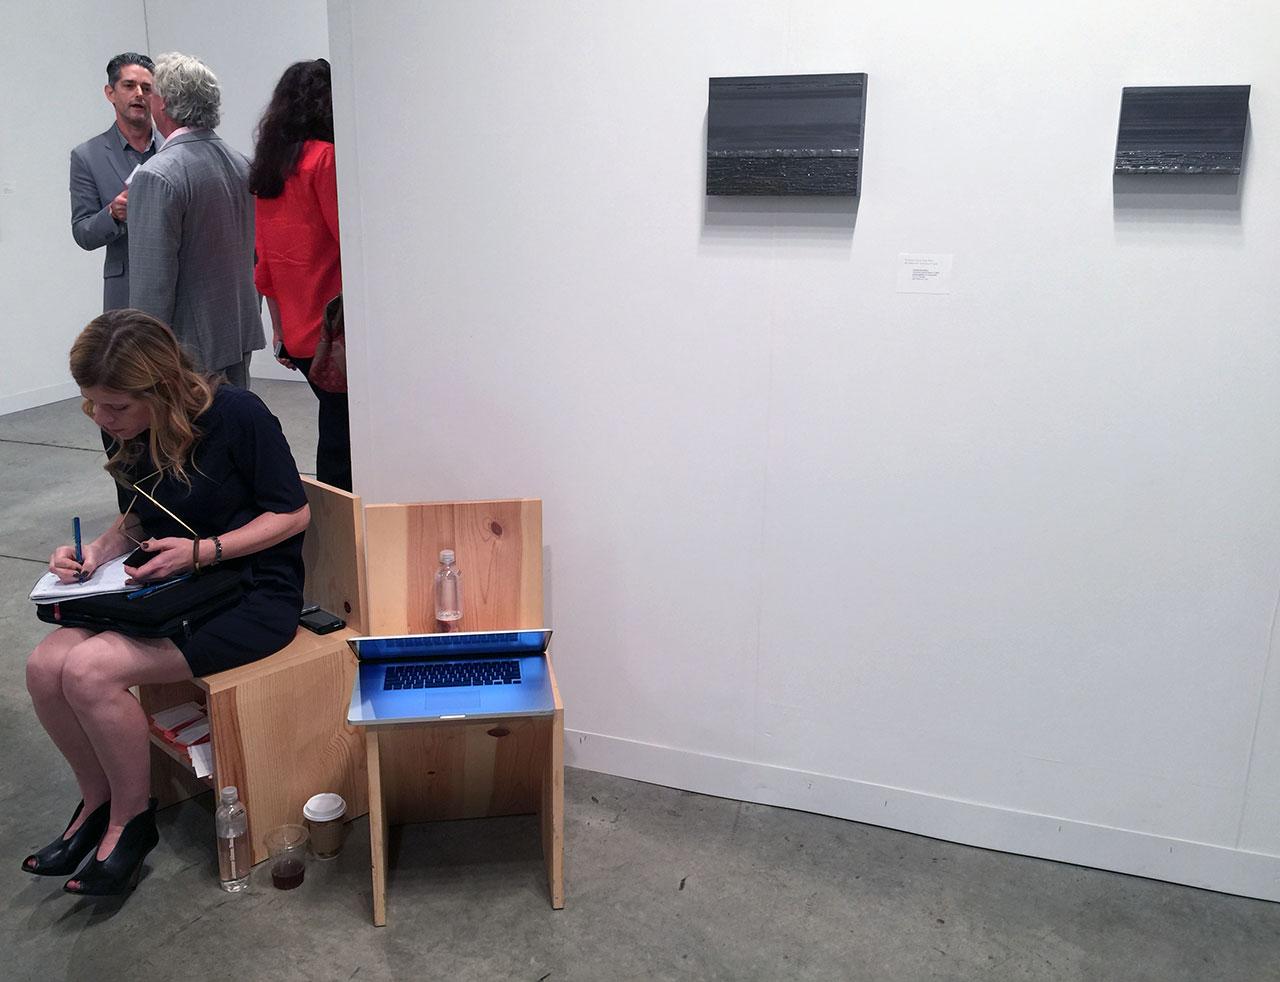 At San Francisco's Anthony Meier Fine Arts